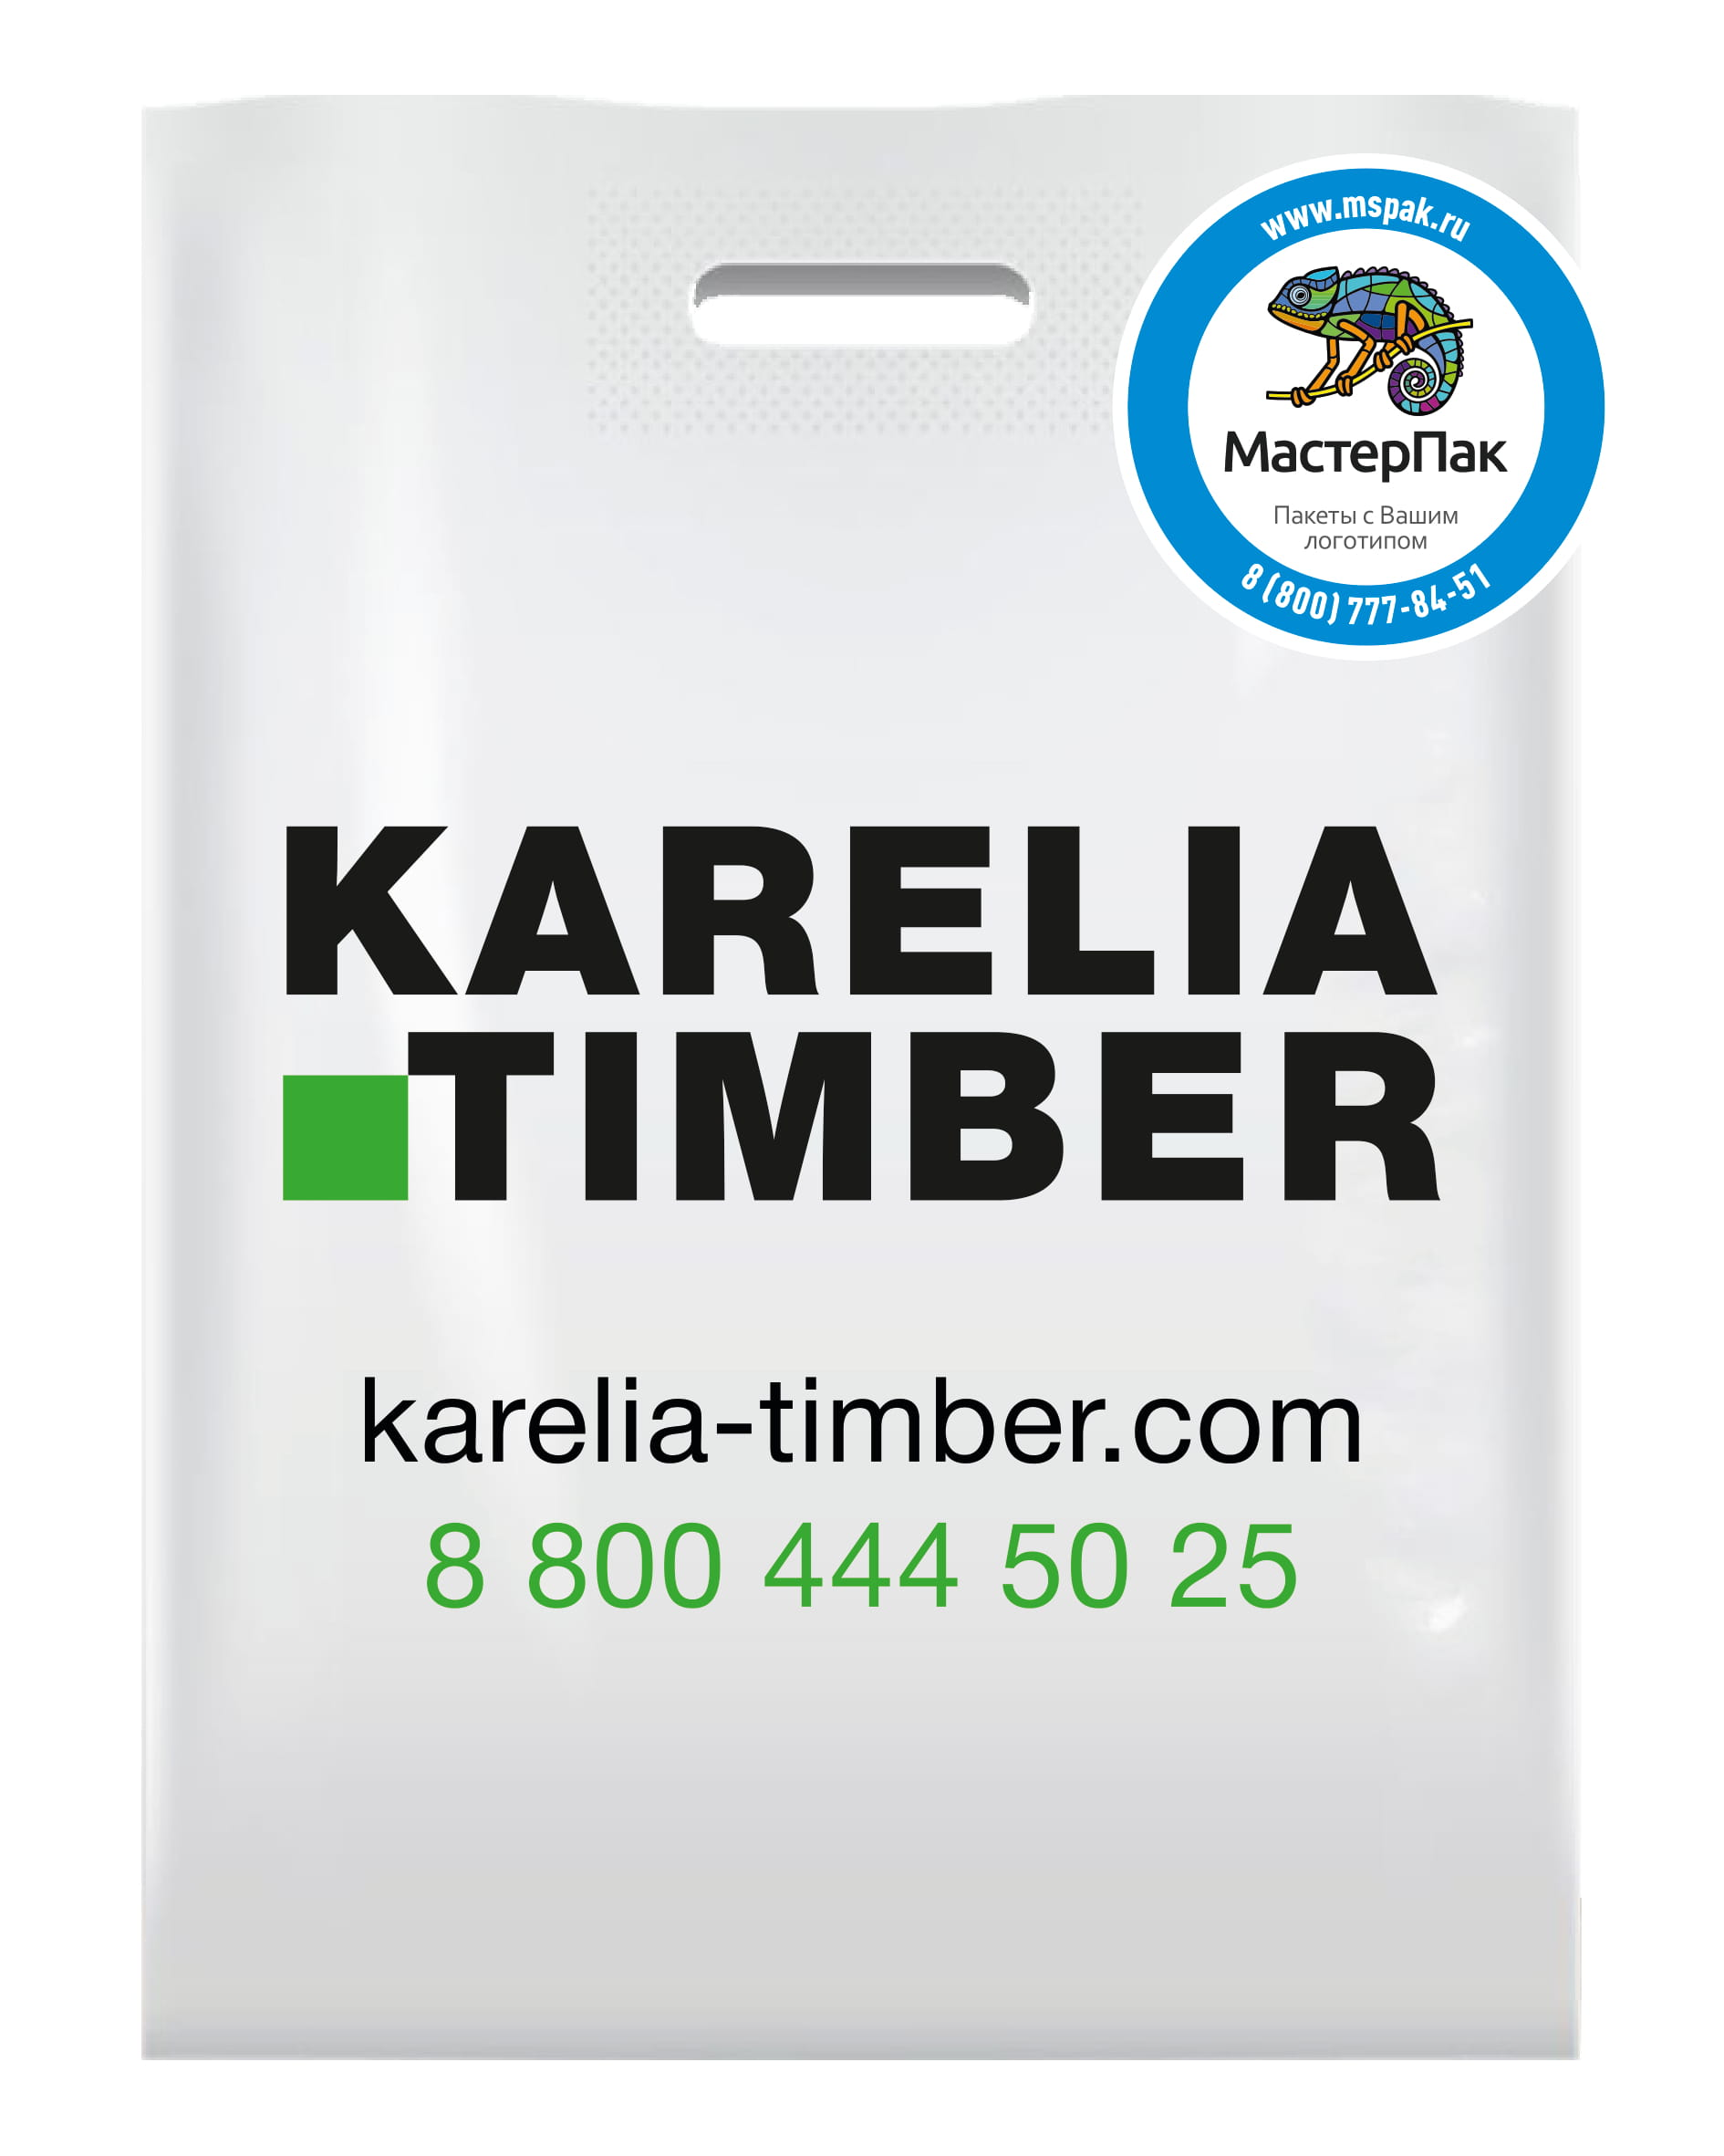 Пакет ПВД с логотипом Karelia Timber, 30*40 см, 70 мкм